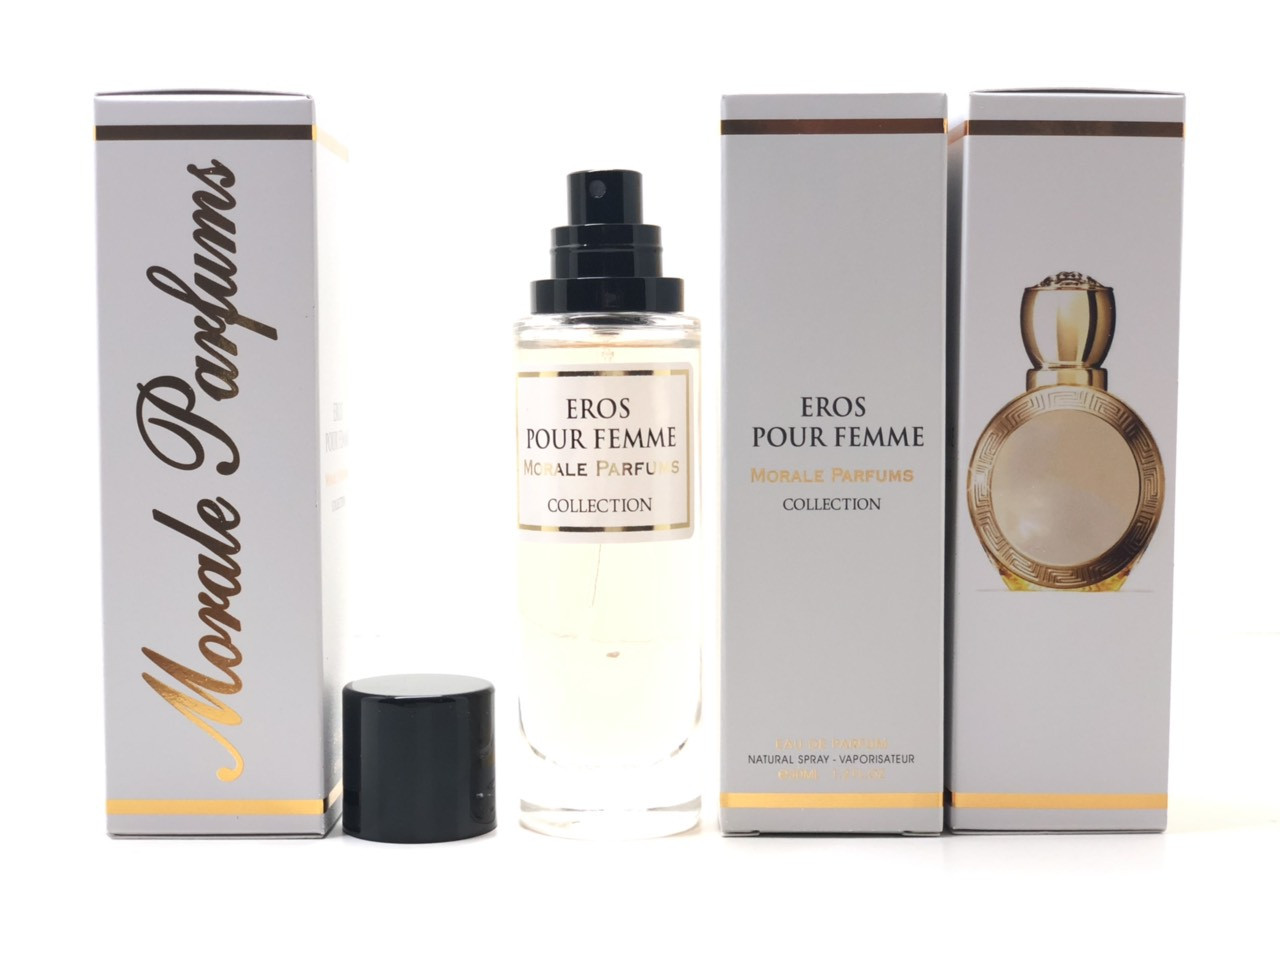 Женский аромат Eros Pour Femme Morale Parfums (Эрос Пур Фэм Морал Парфюм) 30 мл